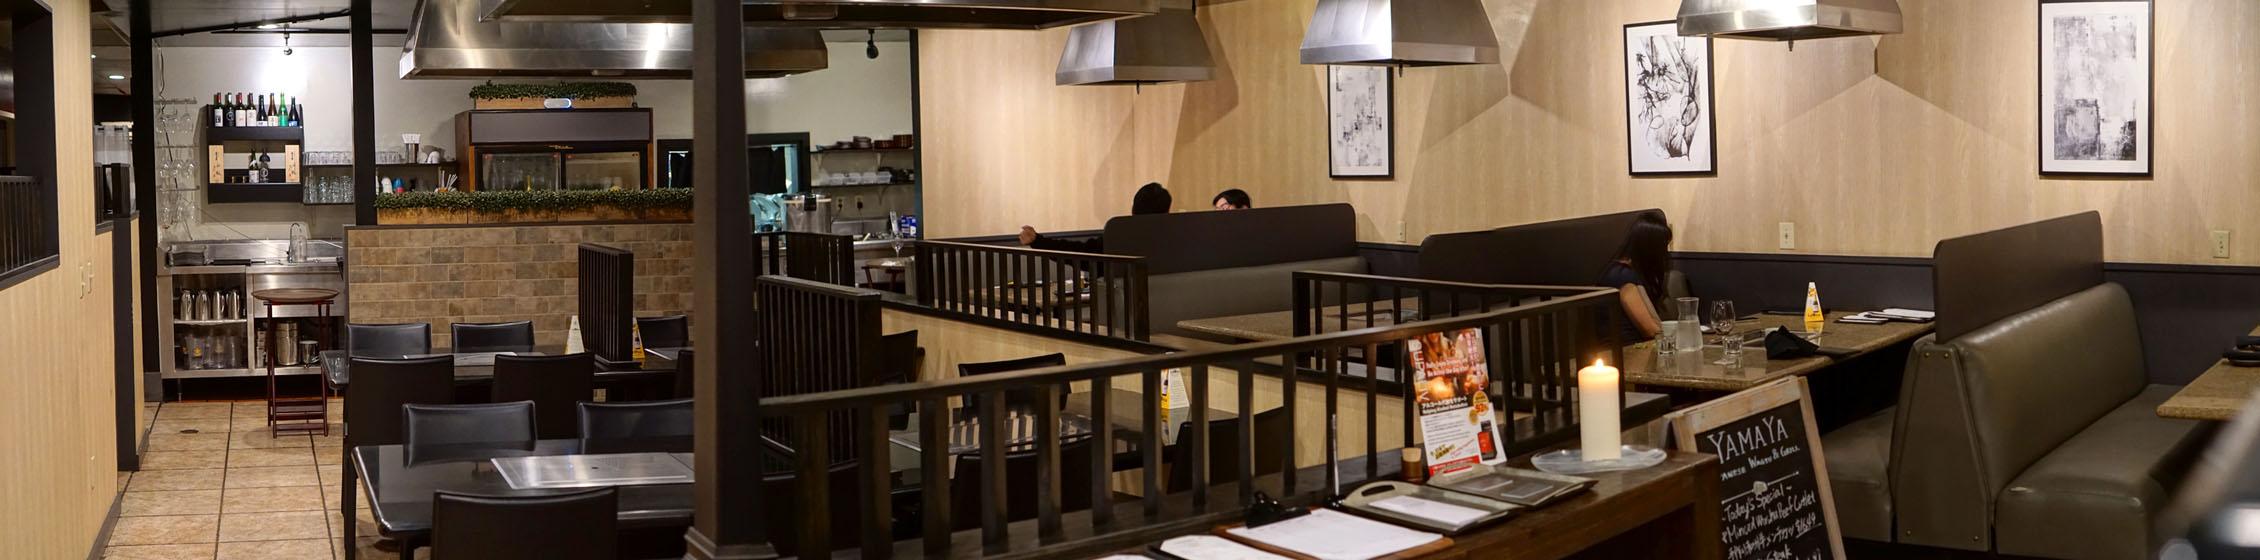 Yamaya Japanese Wagyu & Grill Interior